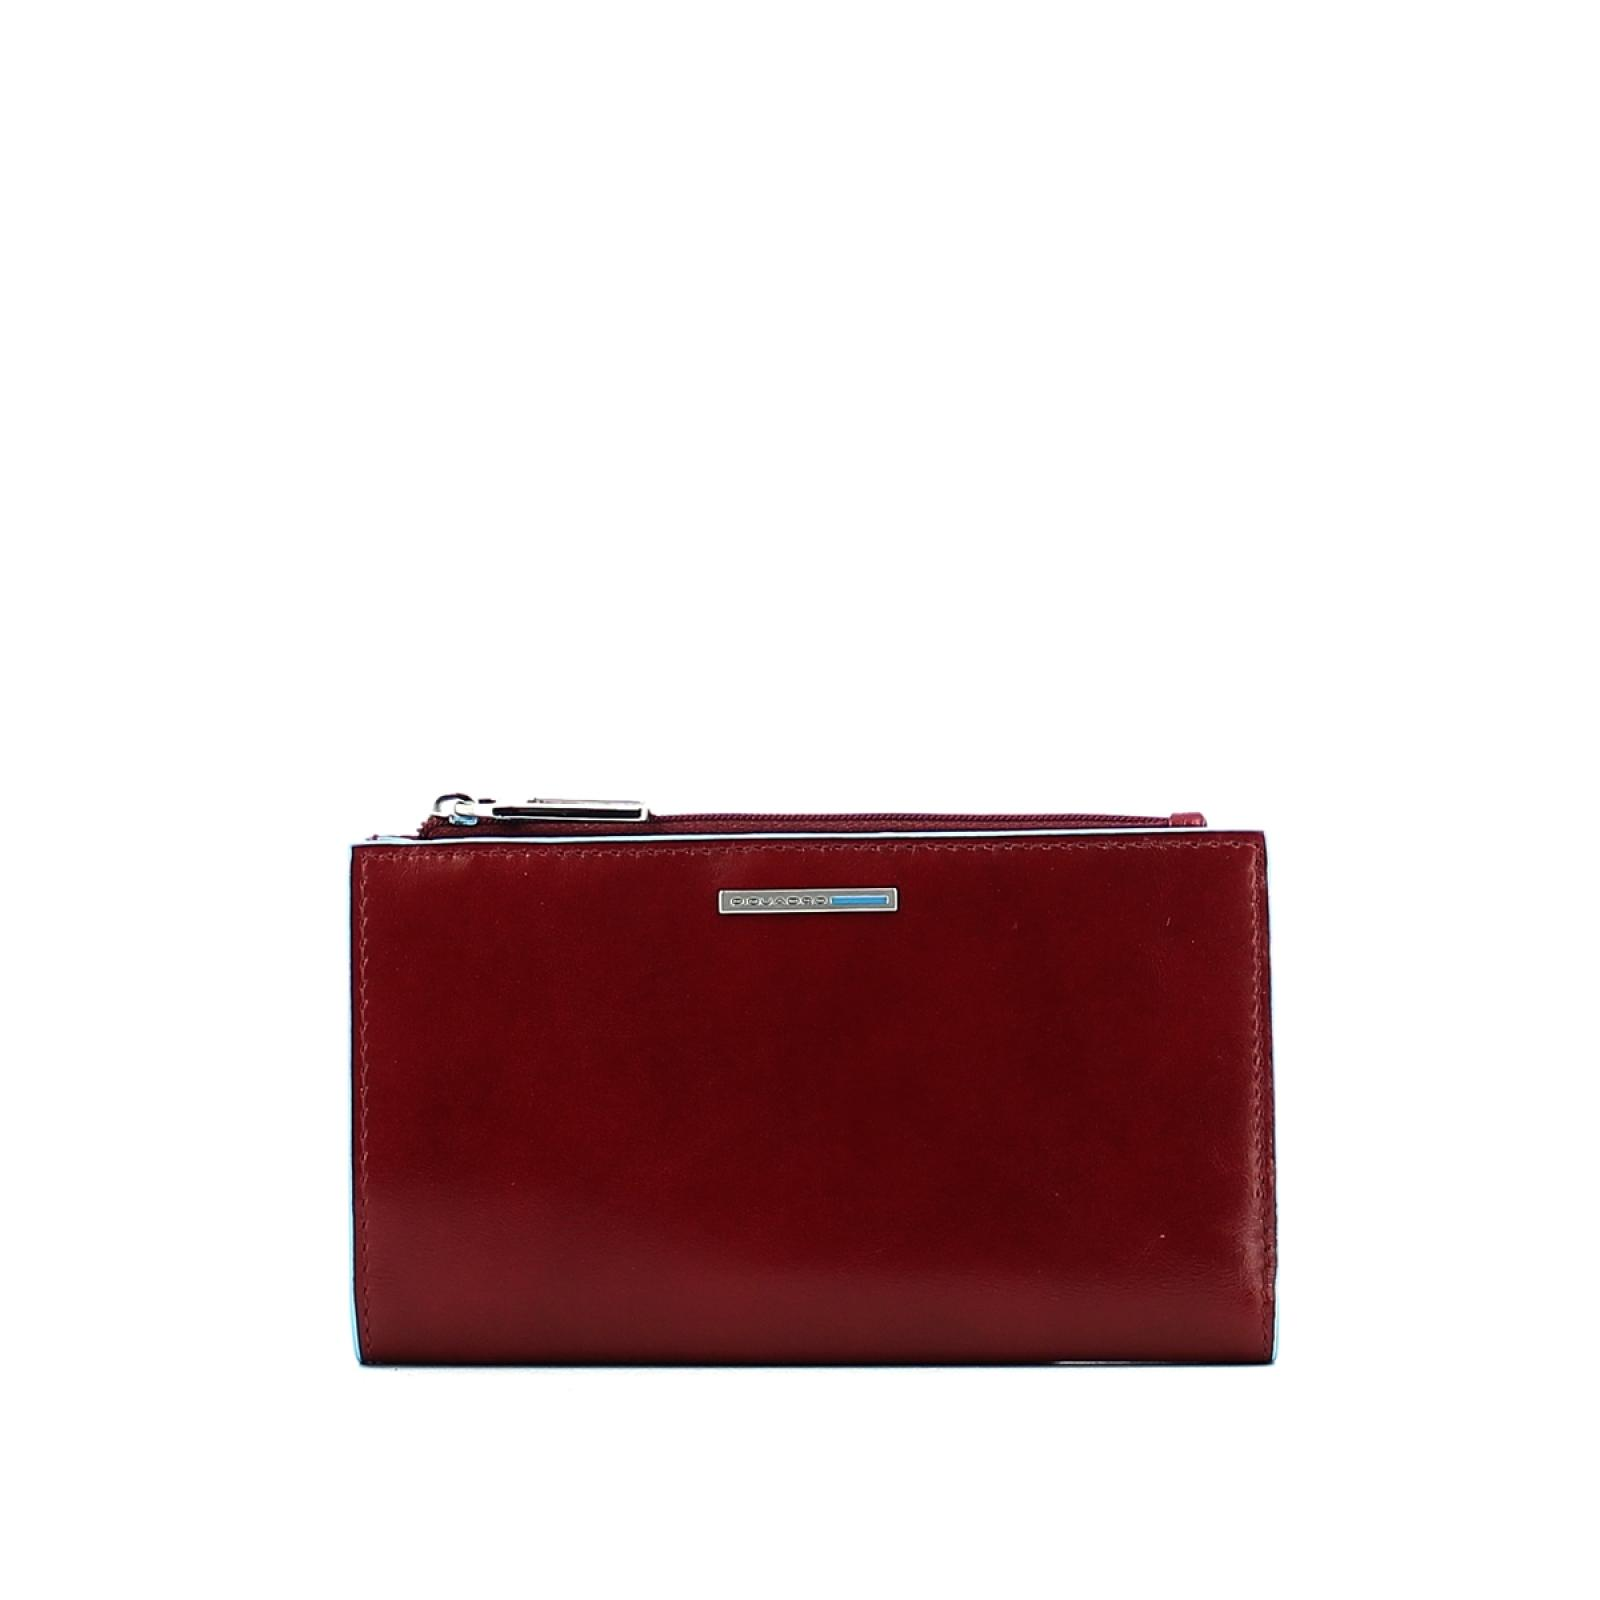 0ba574d086 Slim woman wallet Blue Square. 154090. Brand. Piquadro. Portafogli Donna ...